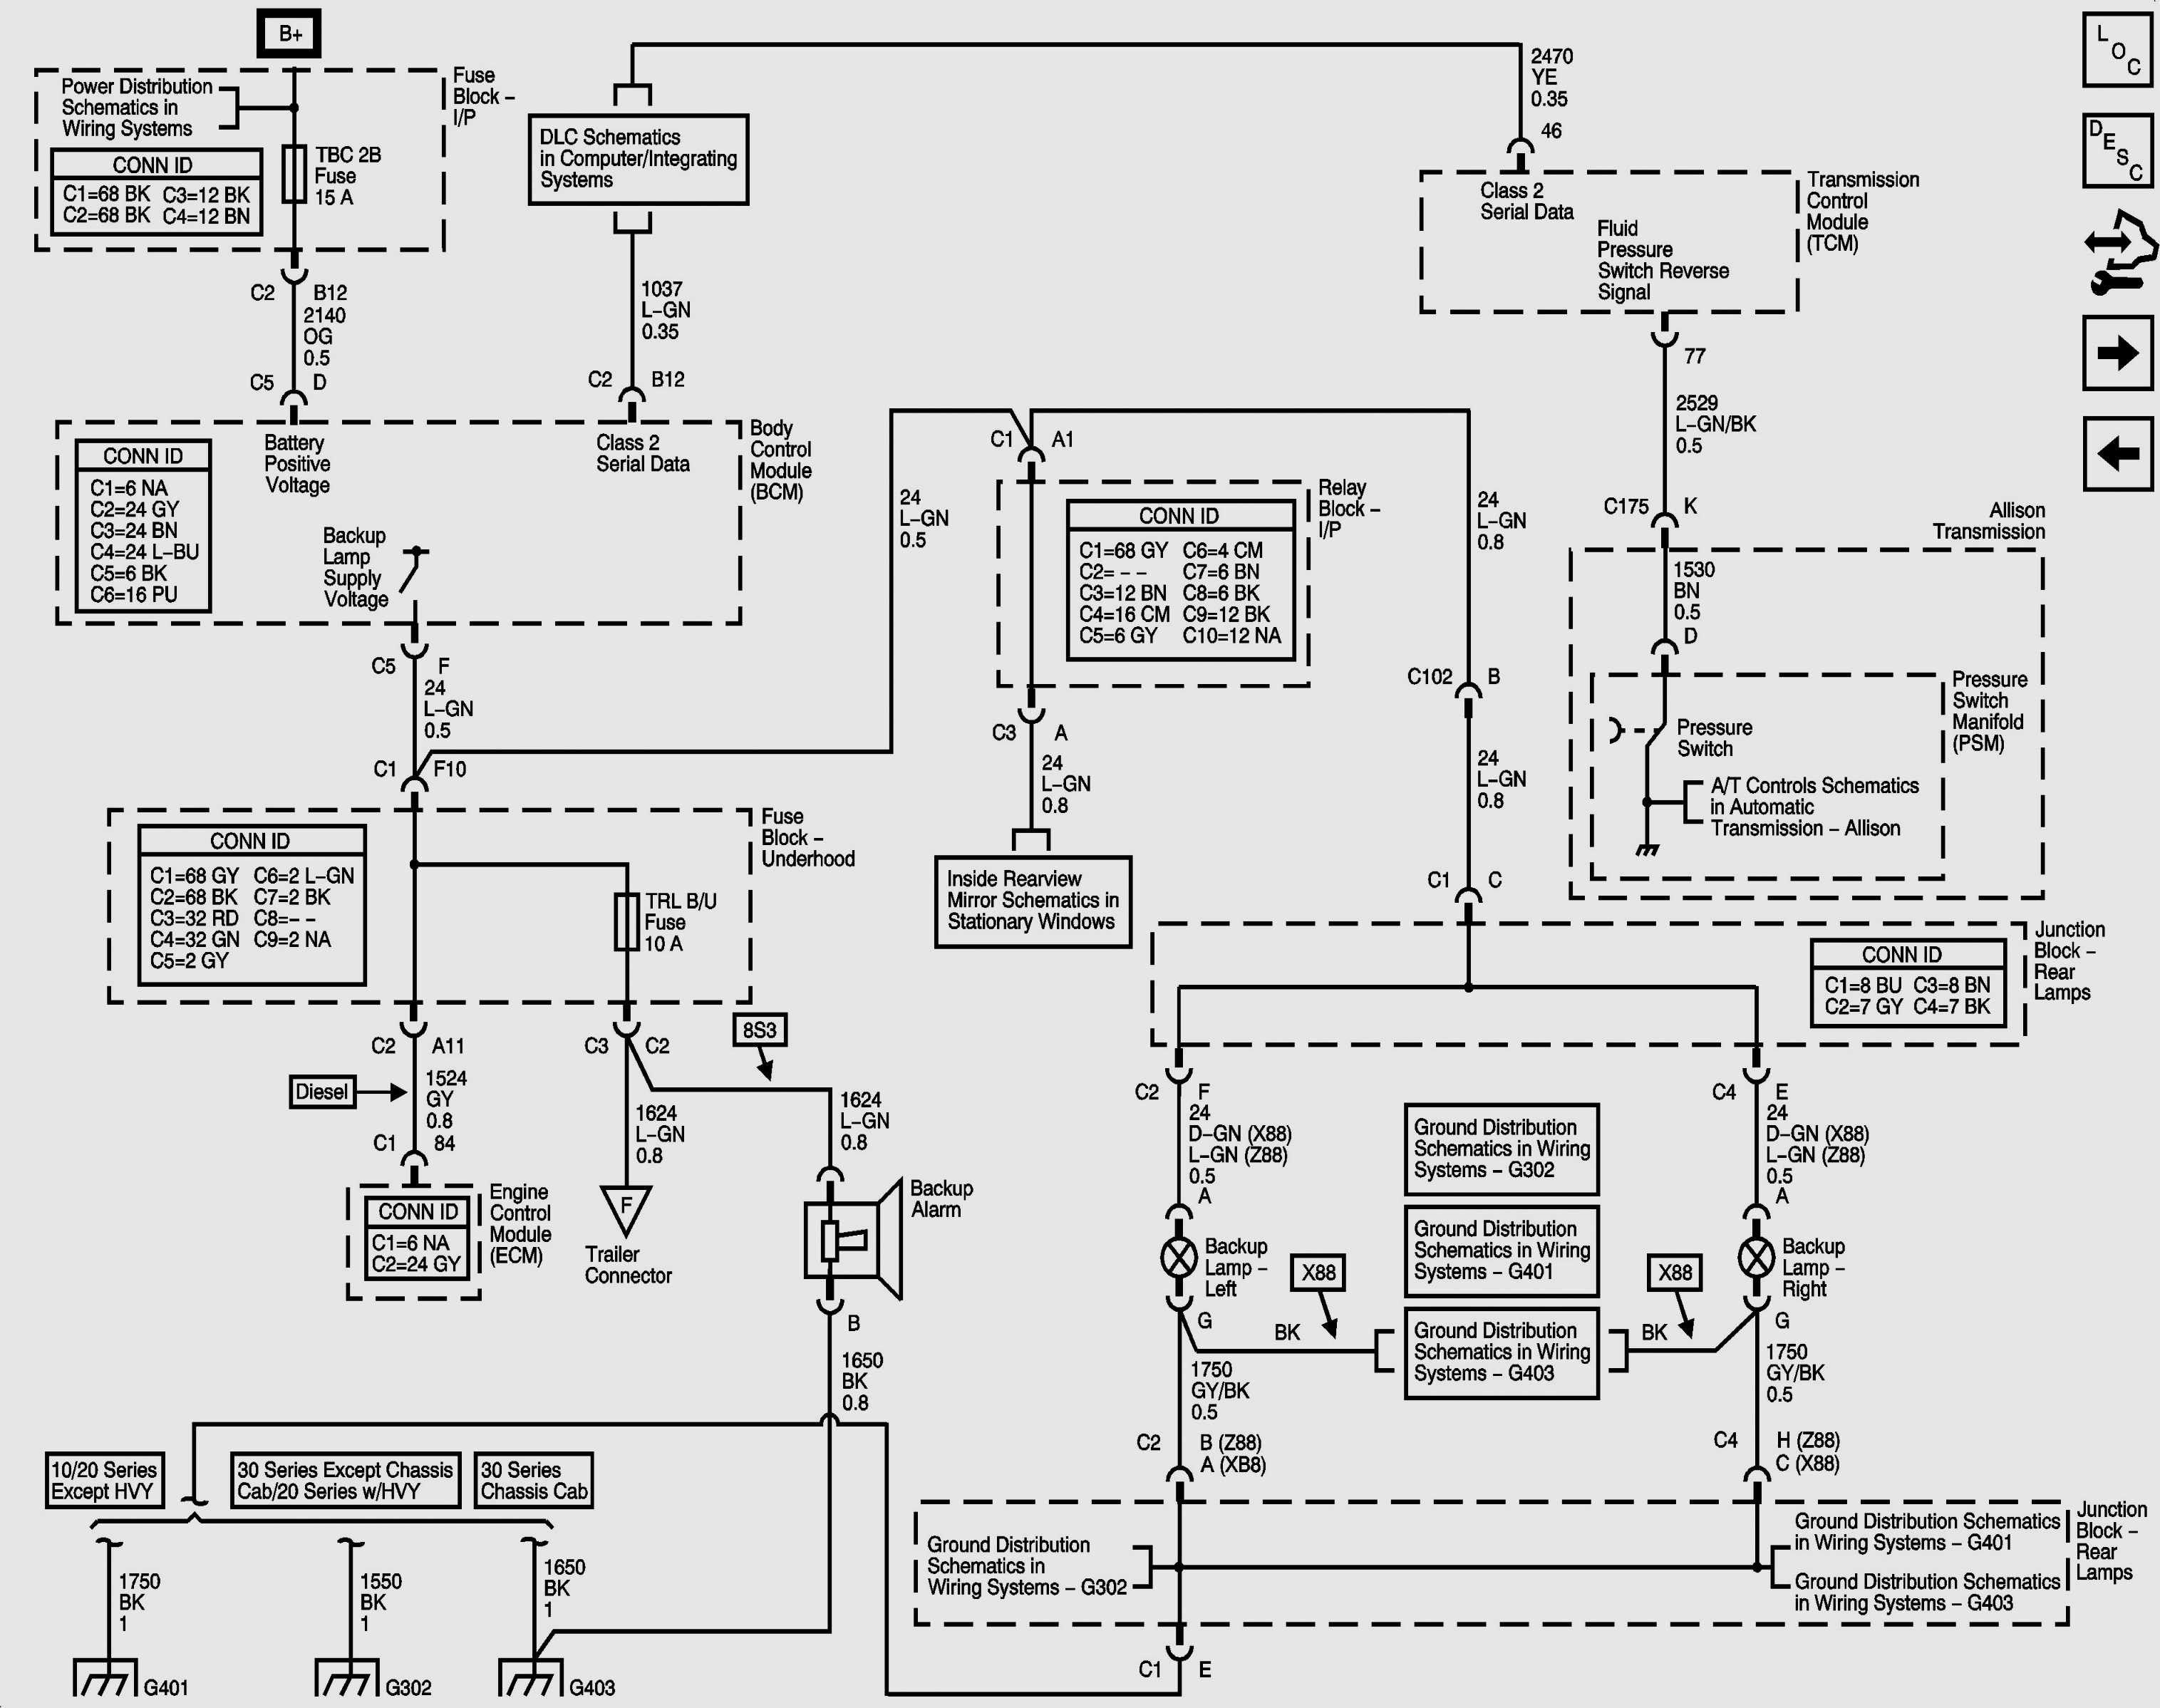 Yamaha Bt1100 Wiring Diagram Elegant In 2020 Trailer Wiring Diagram Electrical Wiring Diagram 2006 Chevy Silverado